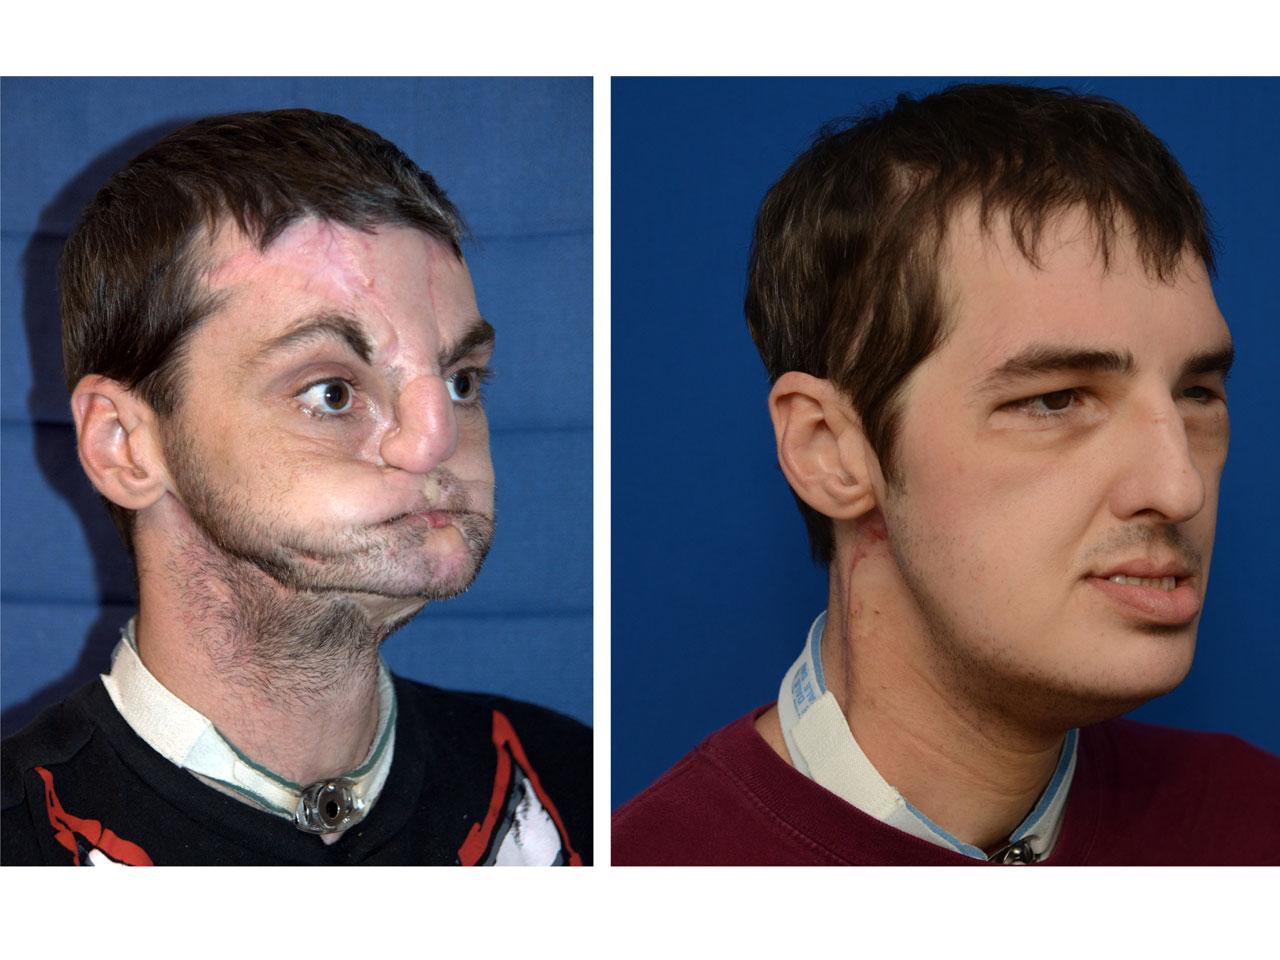 Face Transplant Recipient Impresses Doctors Seven Months